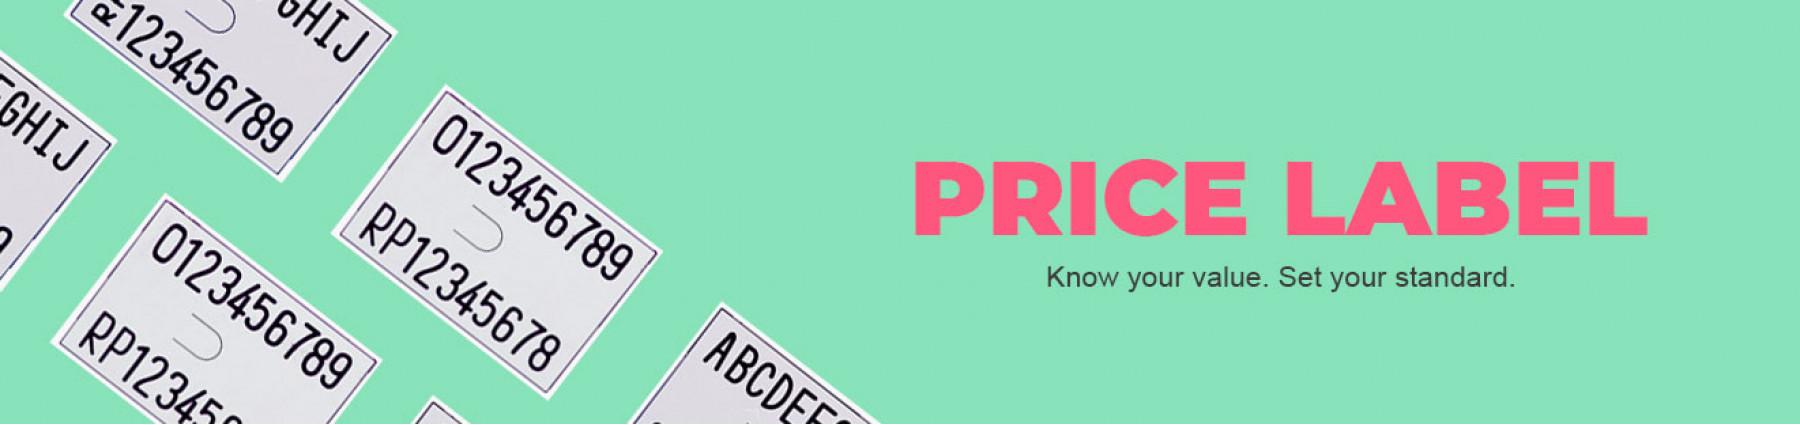 Price Label